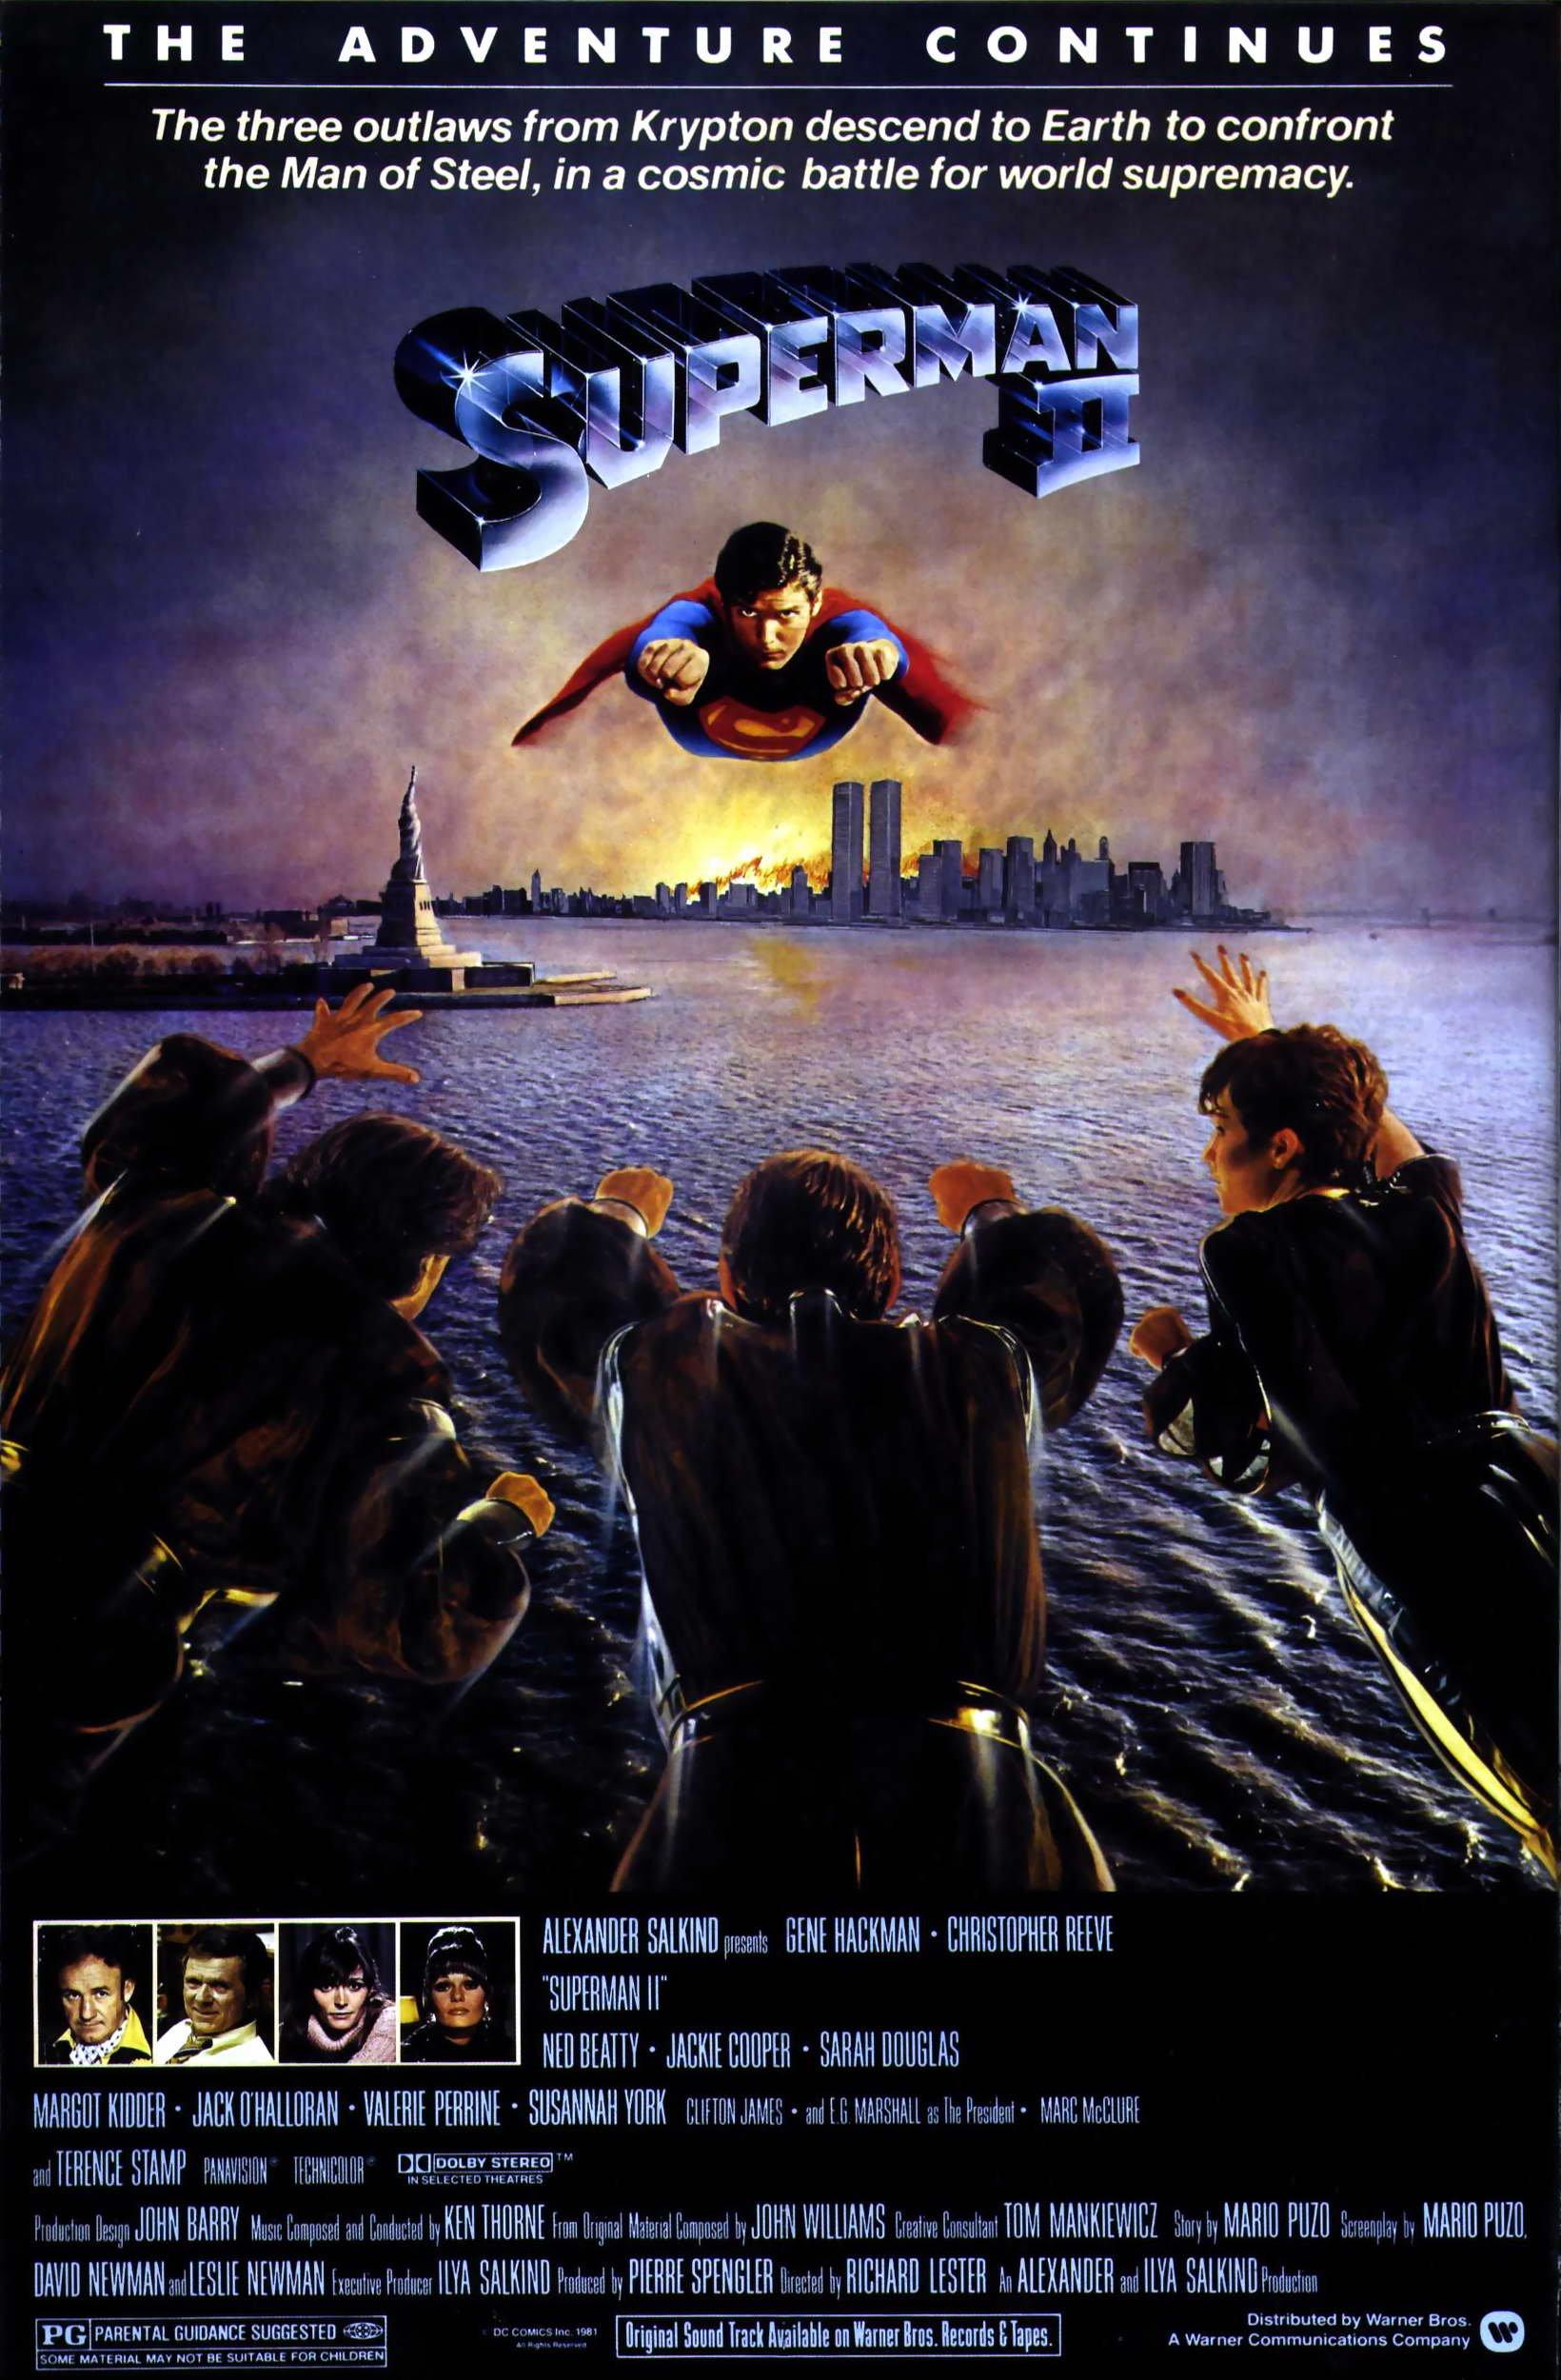 SUPERMAN II (1980, RICHARD LESTER)